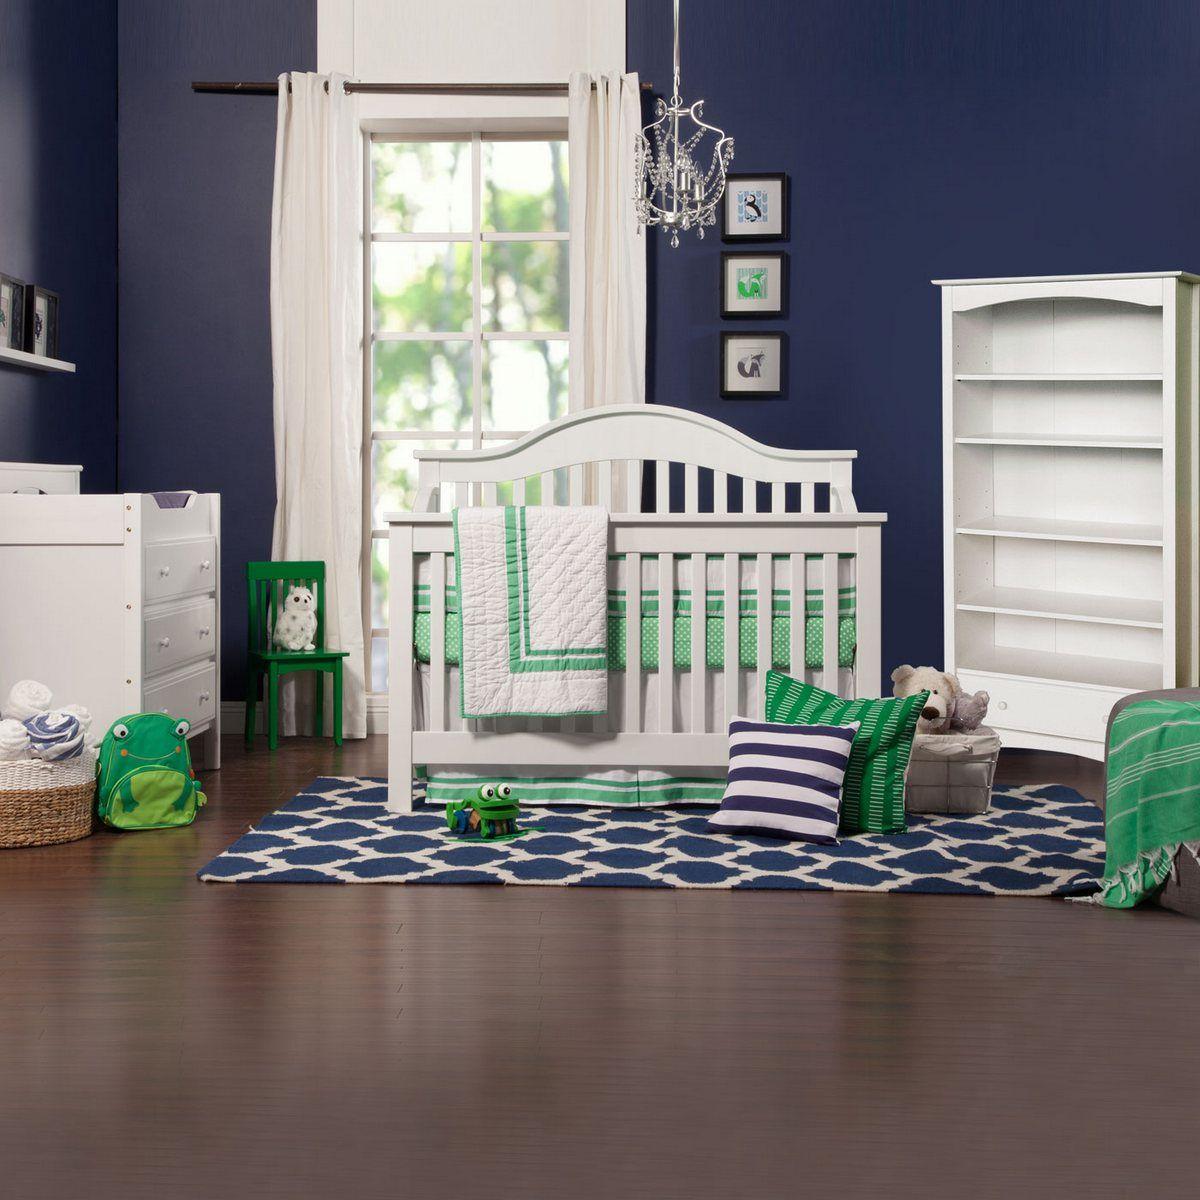 Simplybaby furniture Nursery set, Convertible crib, Cribs